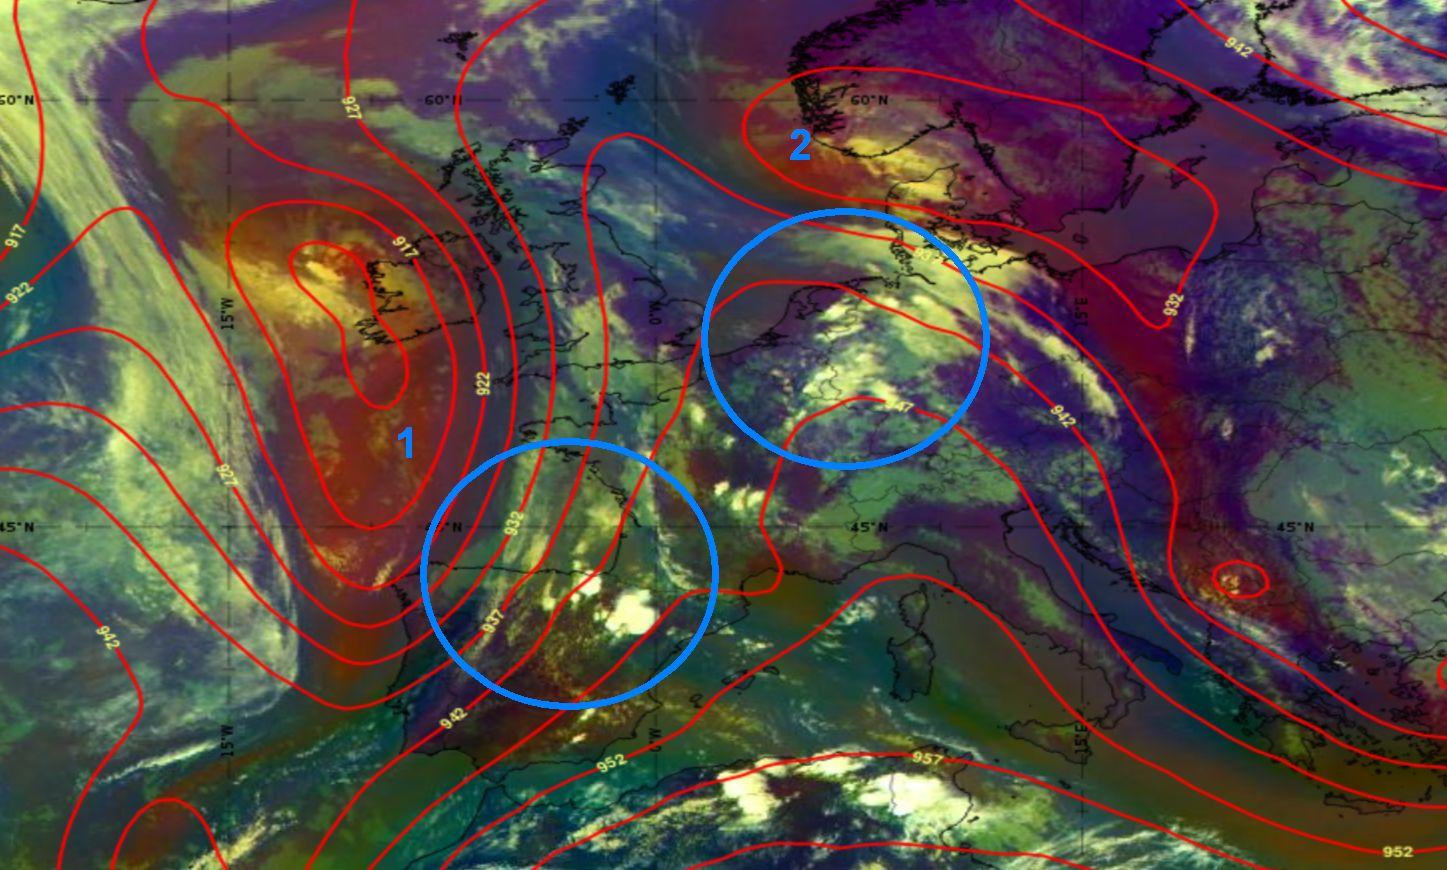 Meteosat-11 Airmass RGB overlaid by ECMWF H300, 3 June 2021